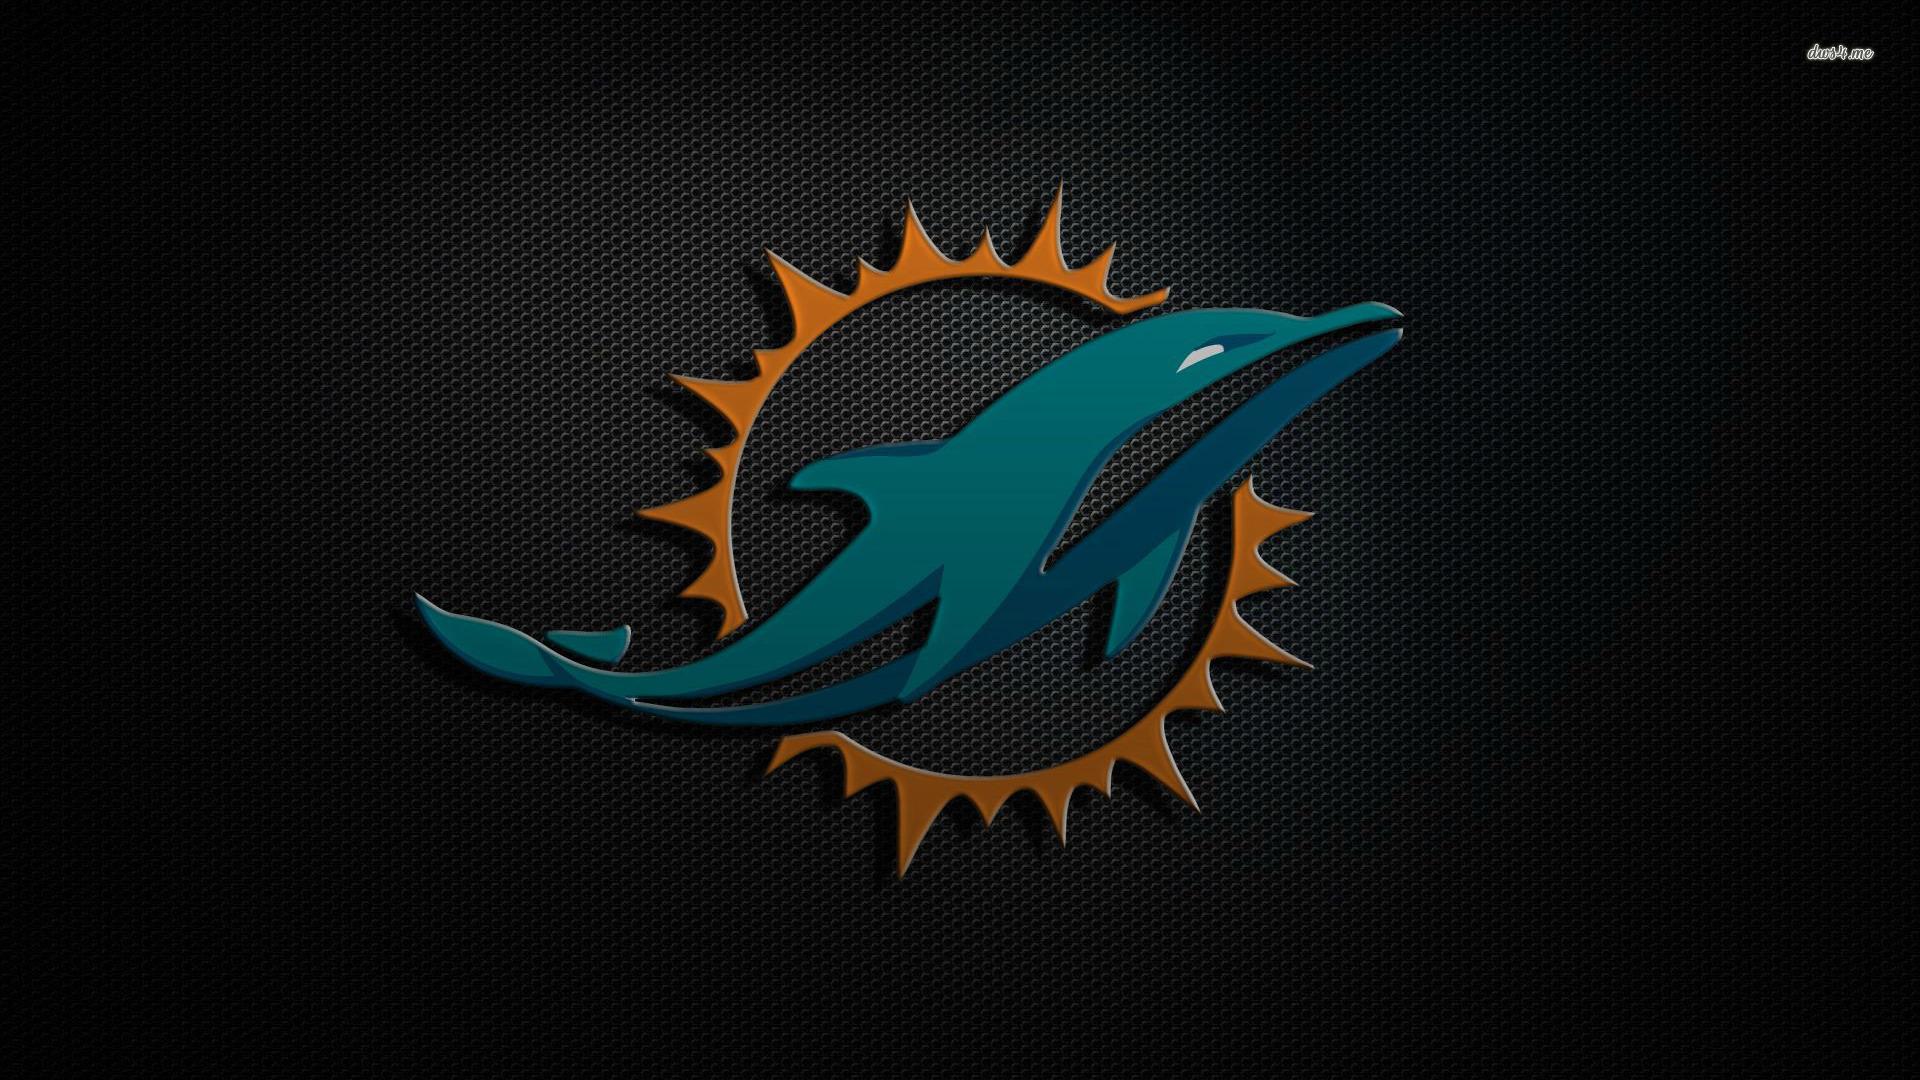 [47+] 2016 Miami Dolphins Wallpaper on WallpaperSafari